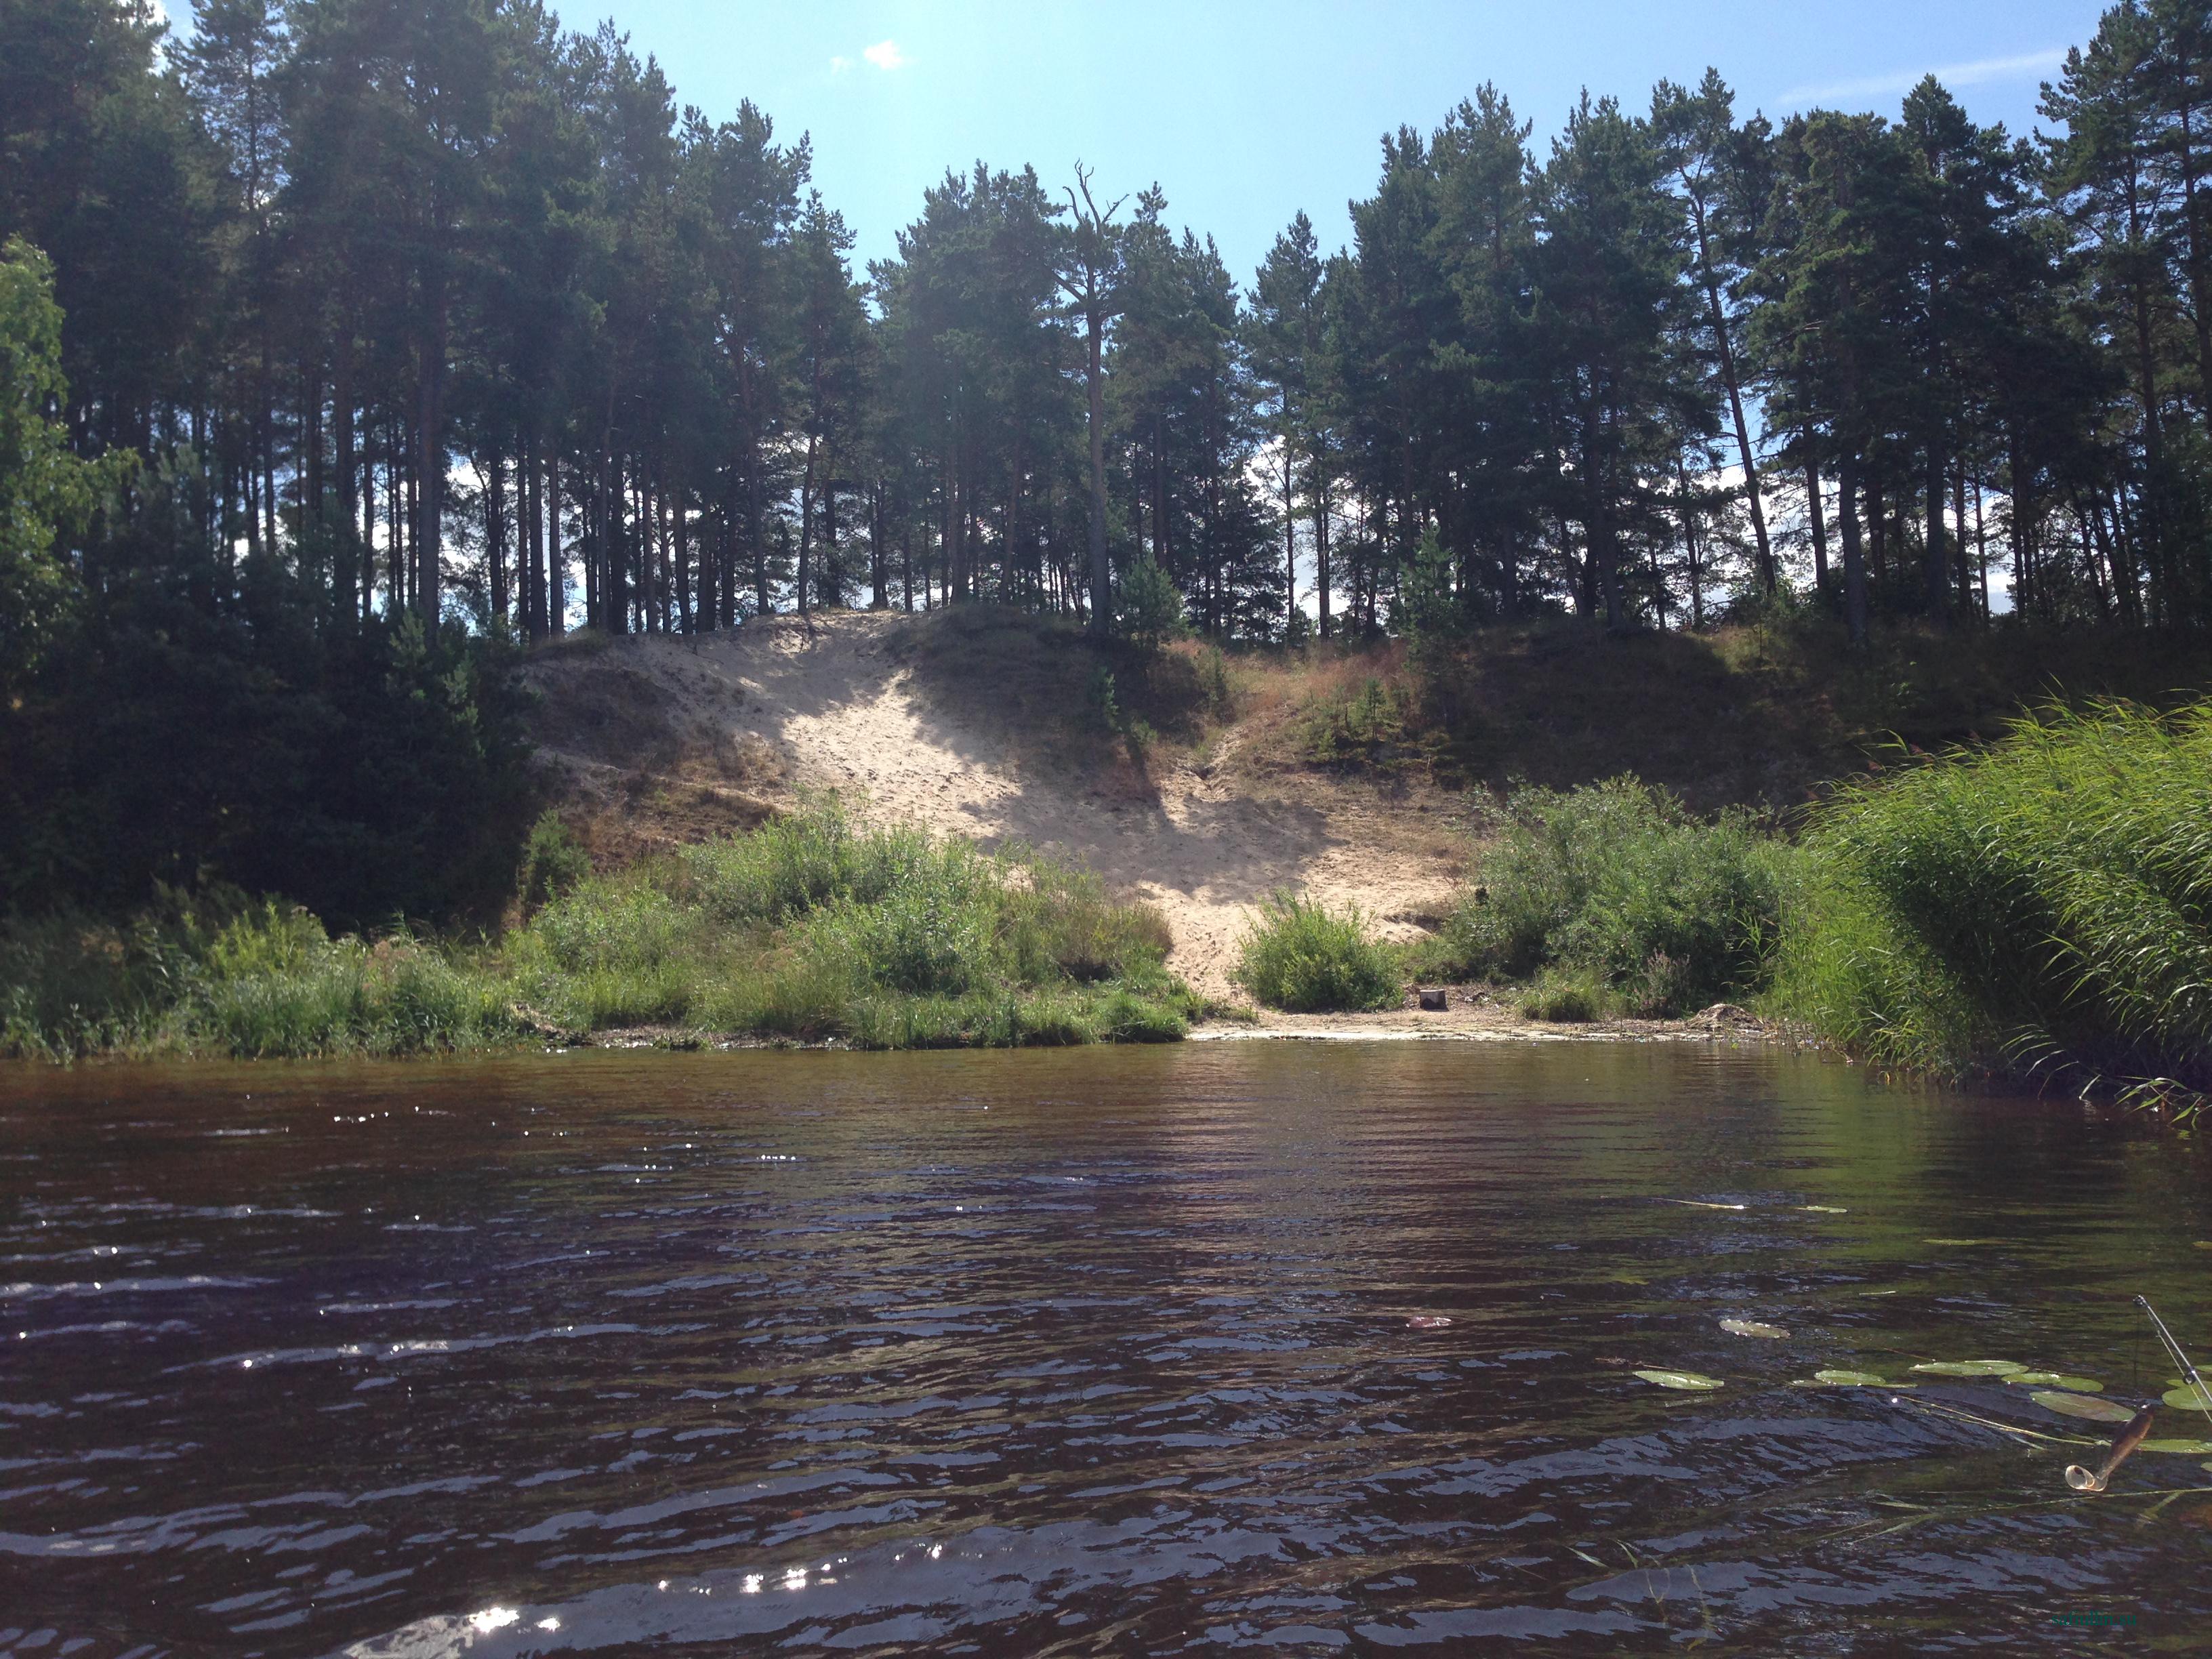 пейзажи природы альберт сафиуллин лето река лиелупе юрмала